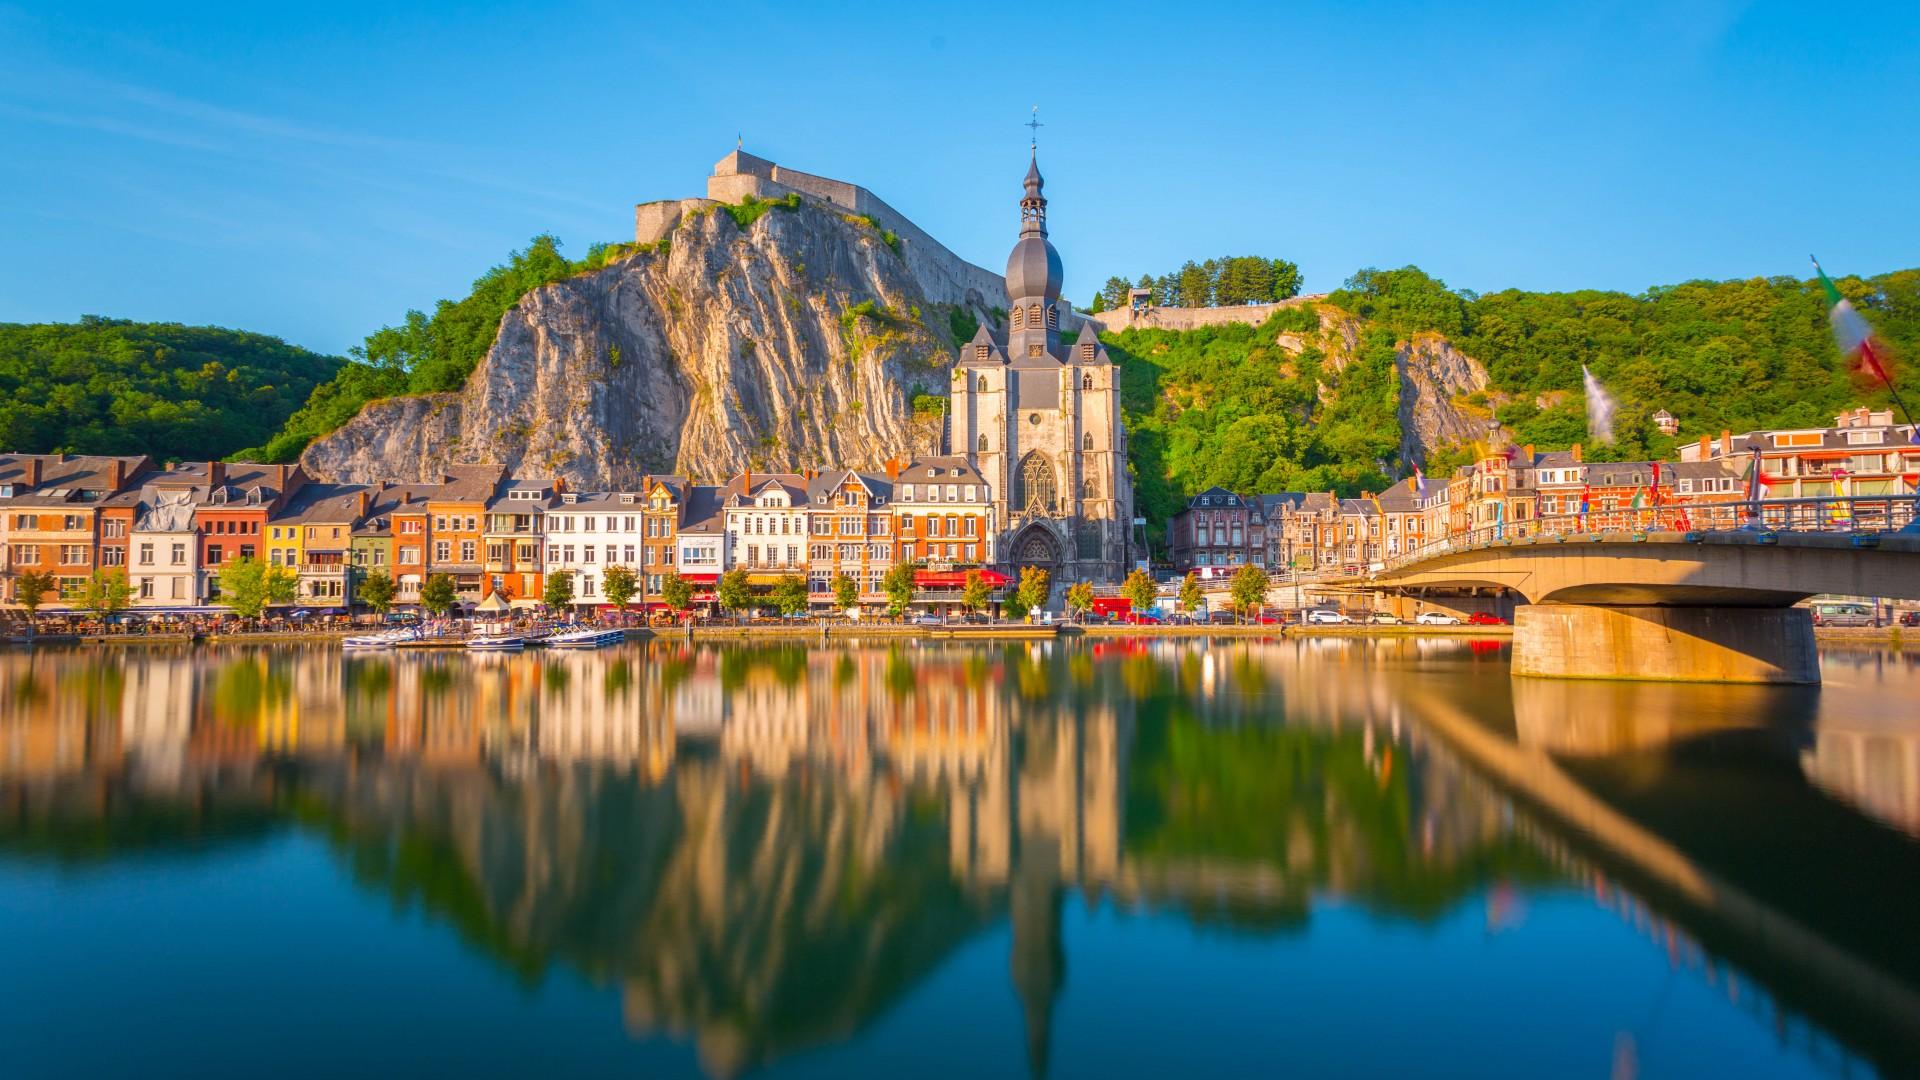 dinant-jembatan-katedral-gothic-dan-sen-secret-world